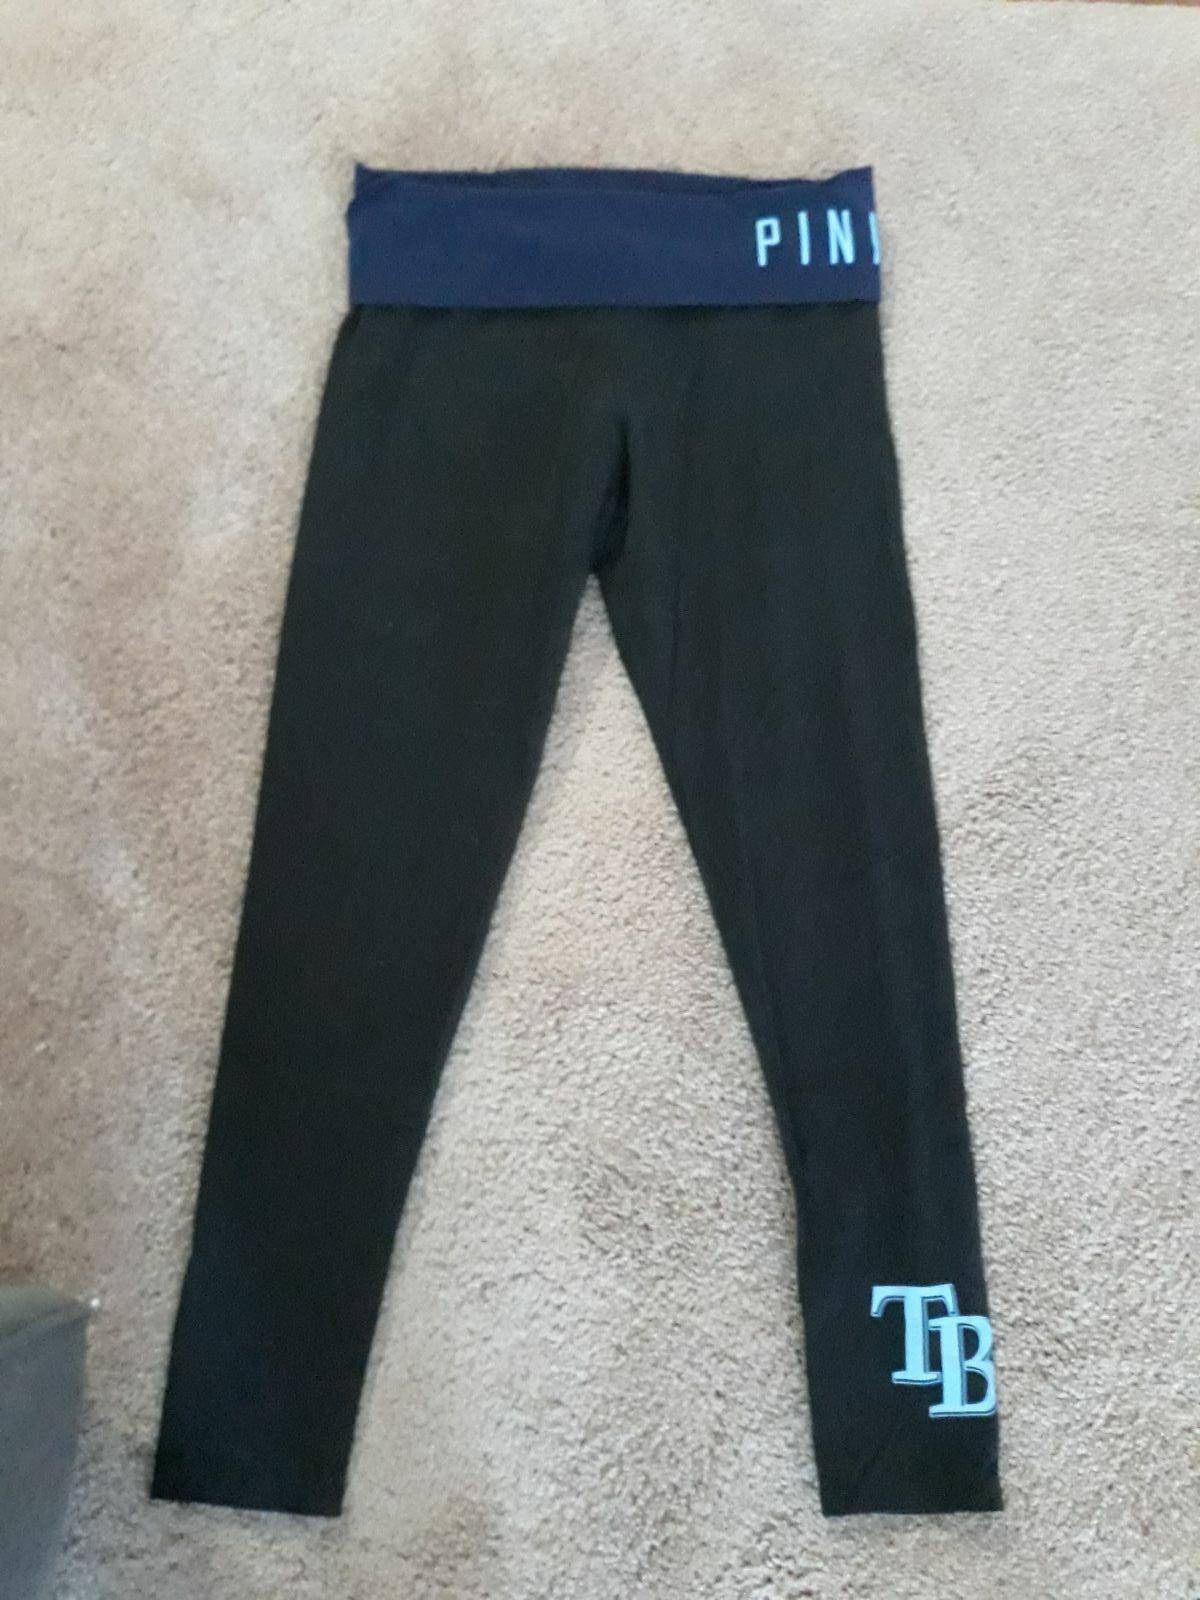 victoria secret Tampa Bay Ray's leggings